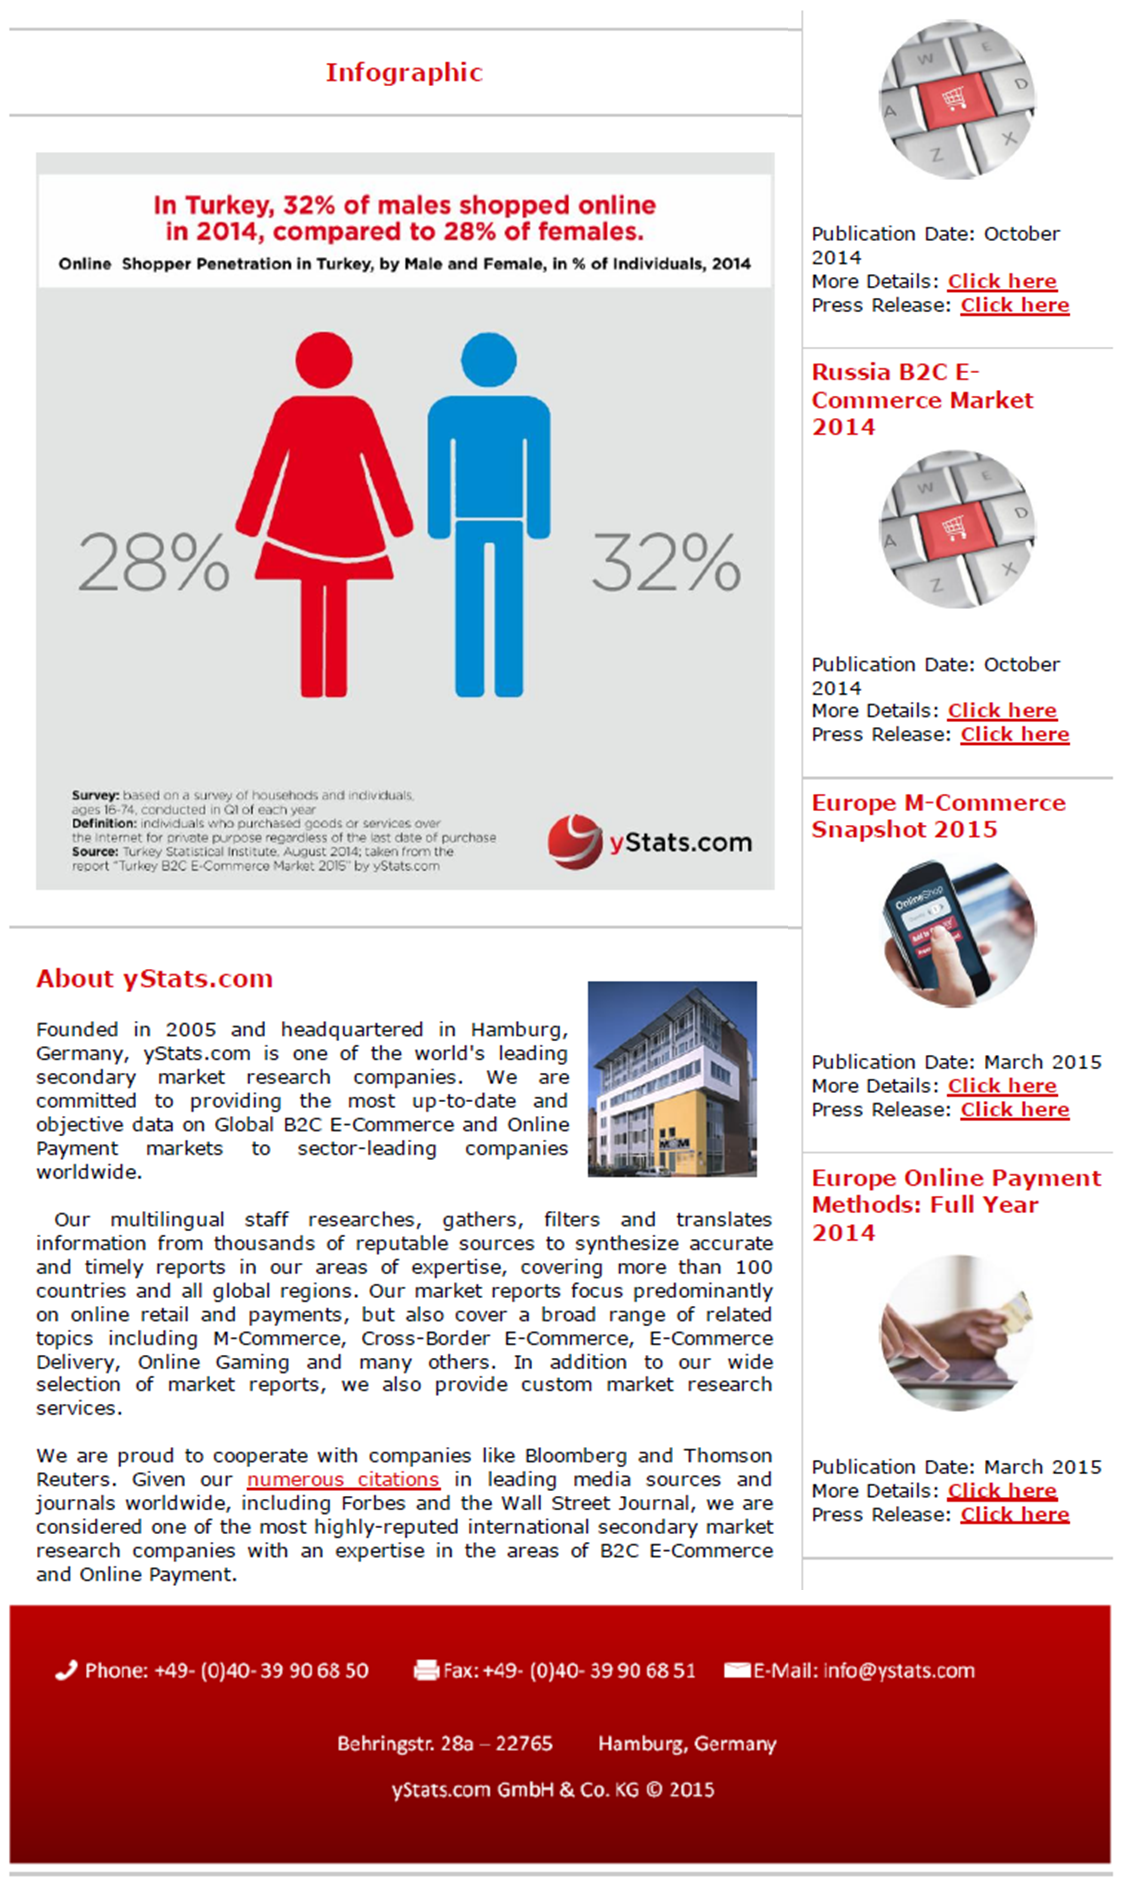 Turkey Infographic 2